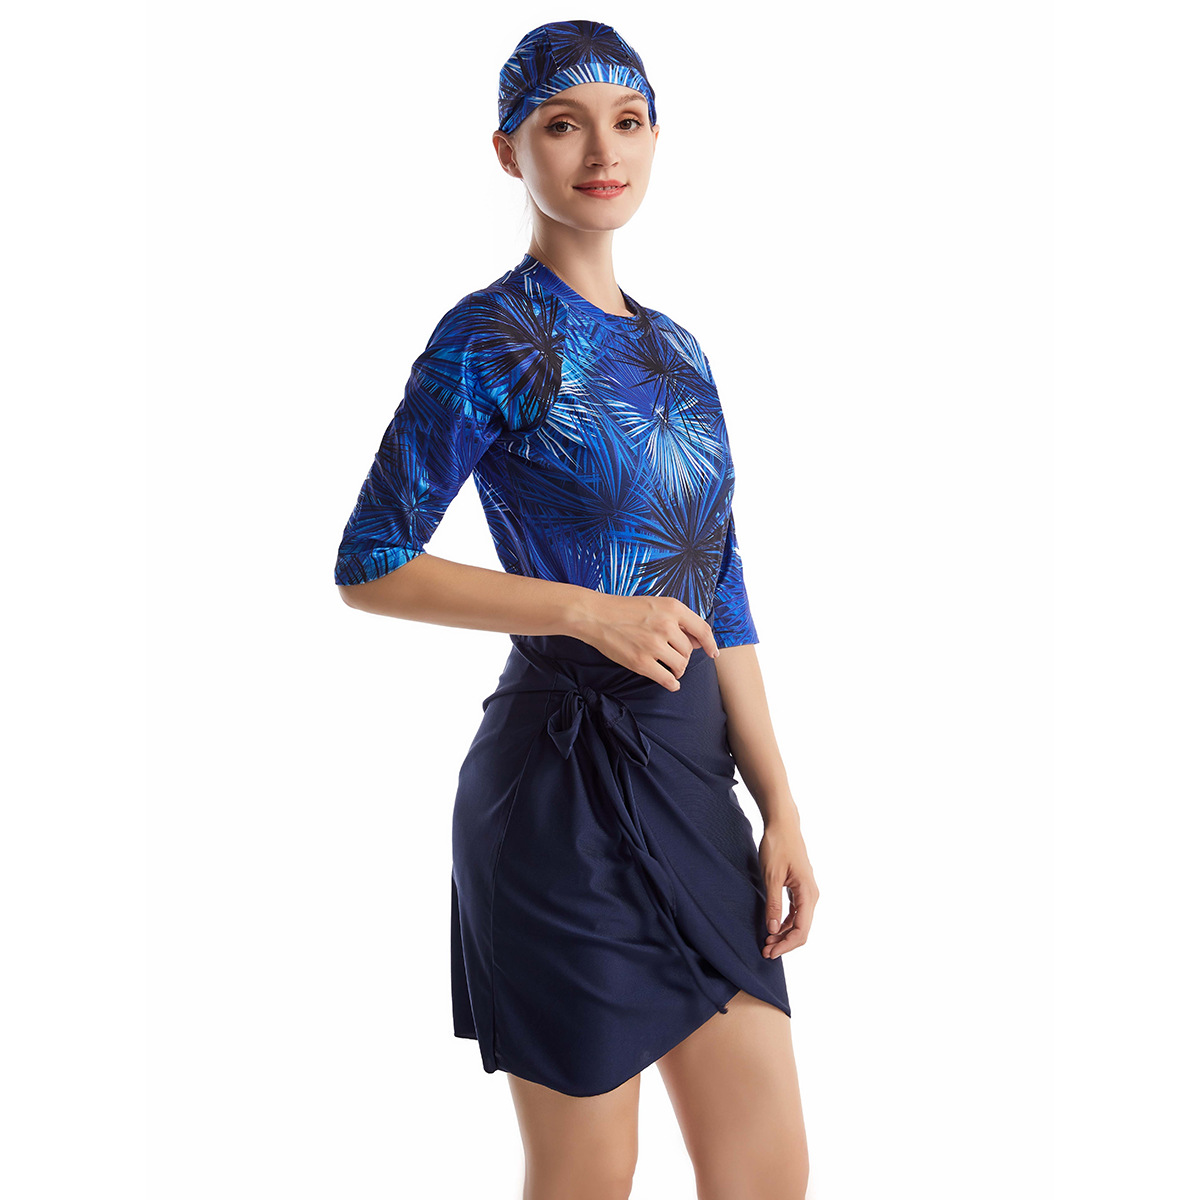 Frauen Rashguard Bademode Body + Rock + Kappe navy blue 2.jpg